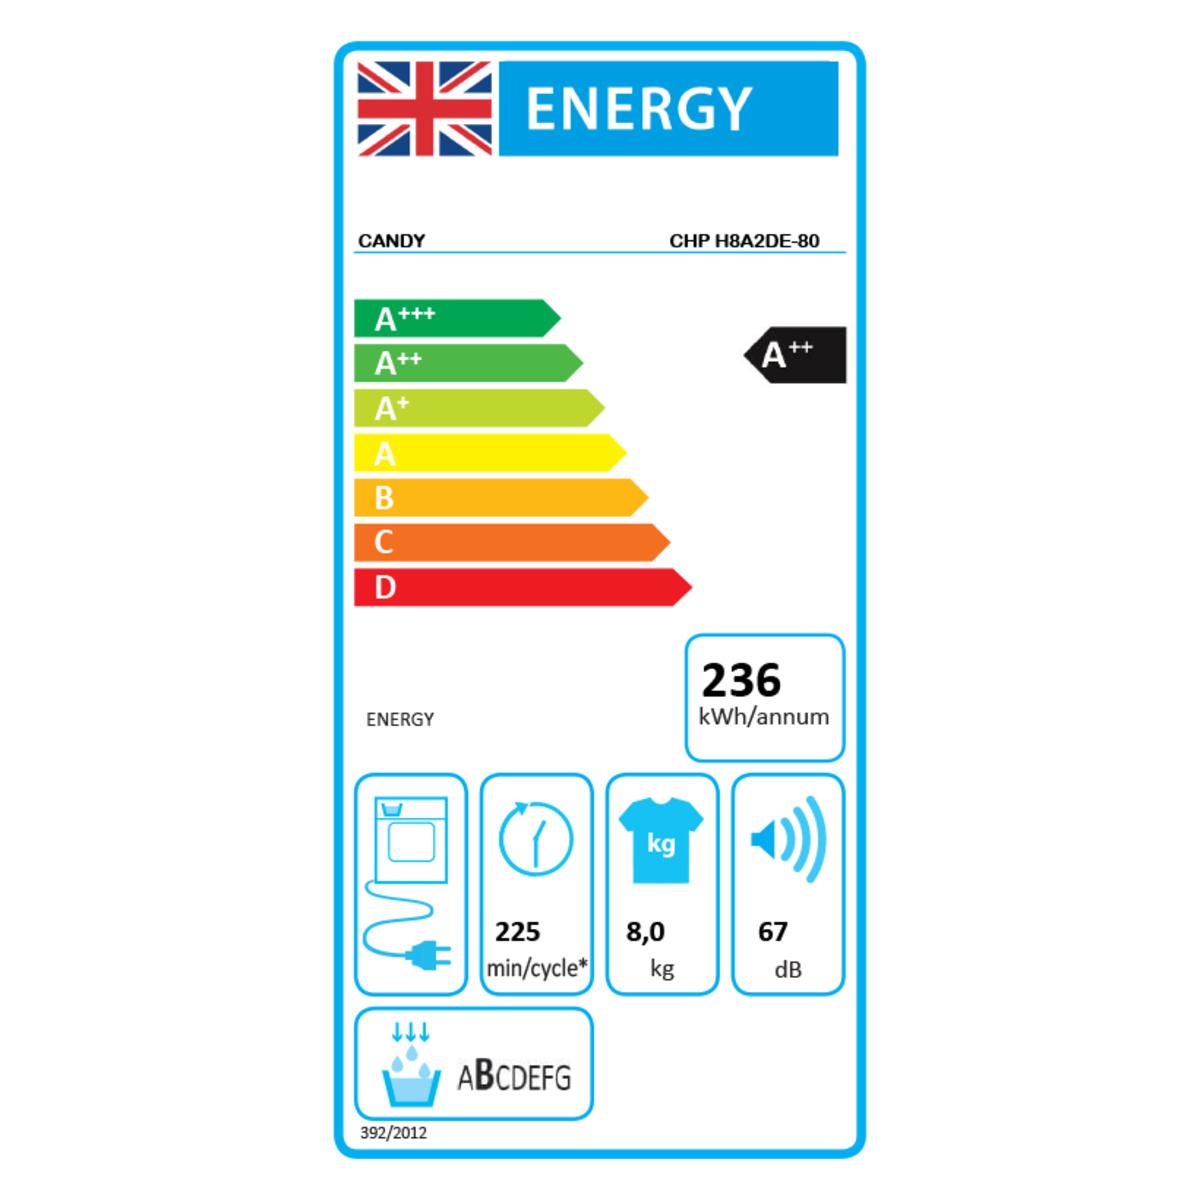 Samsung DV80TA020TE/EU A++ 8kg Heat Pump Tumble Dryer, White